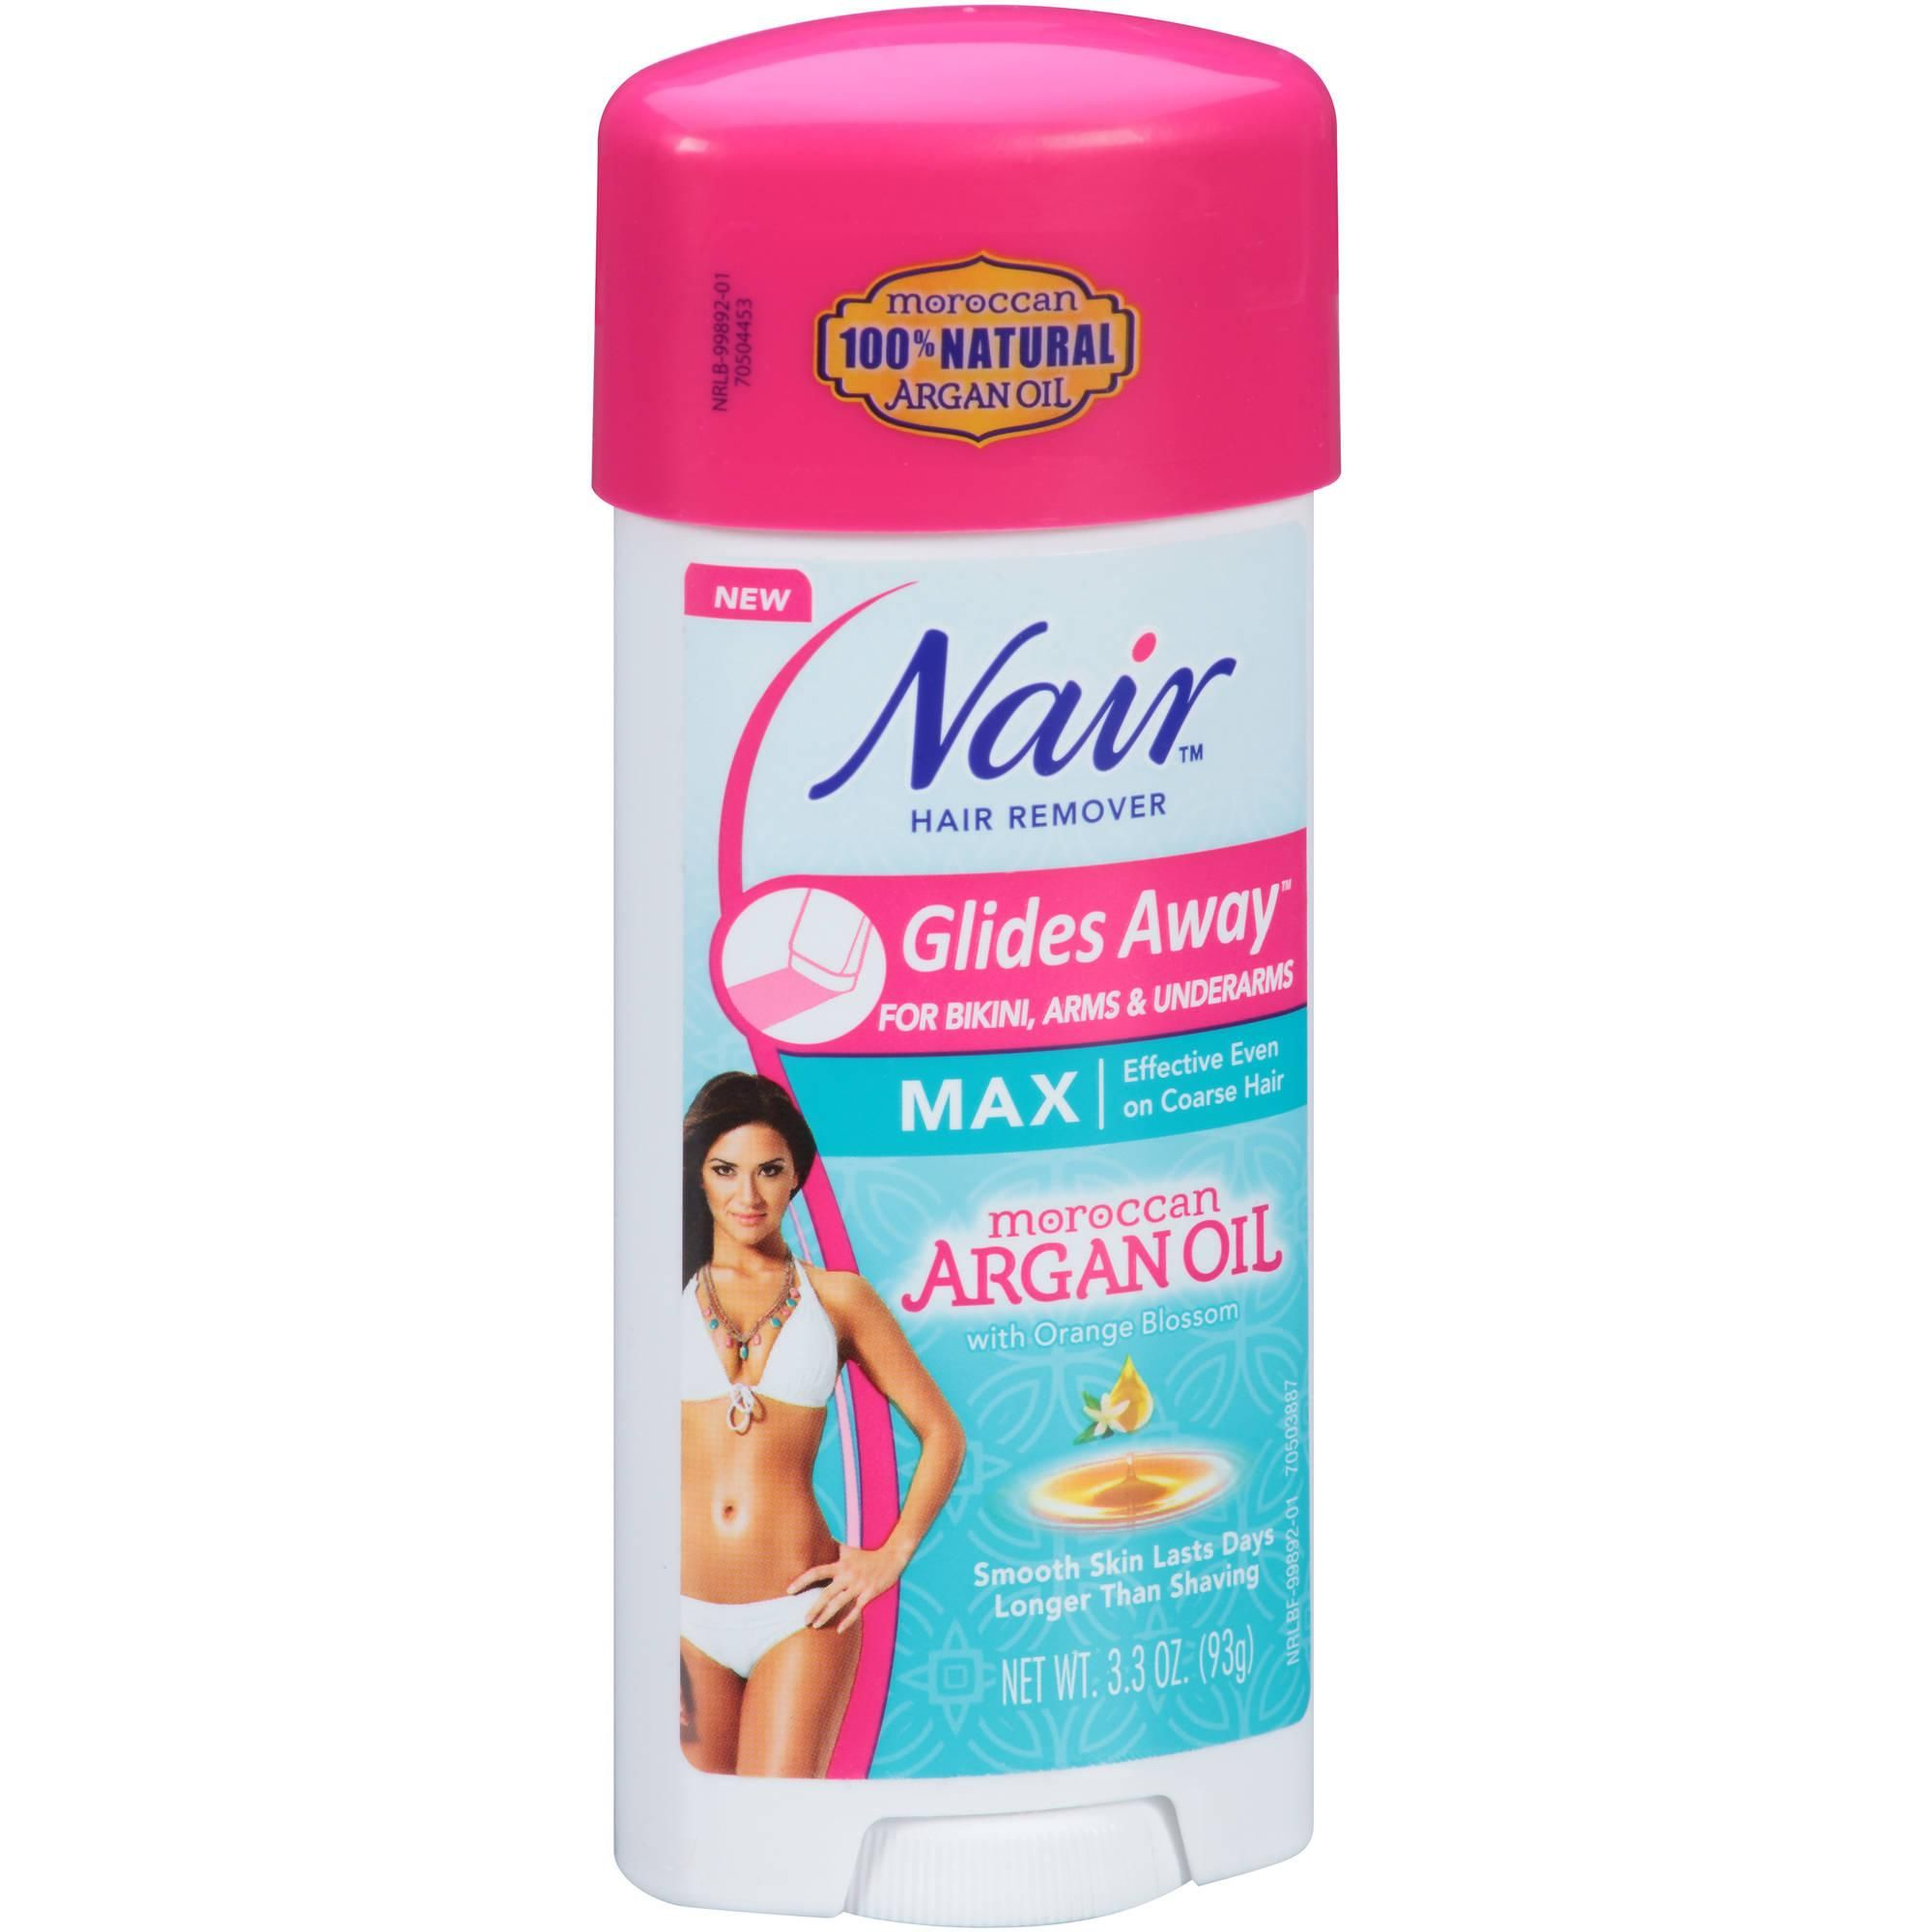 Nair Glides Away Hair Remover for Bikini, Arms & Underarms, 3.3 oz -  Walmart.com